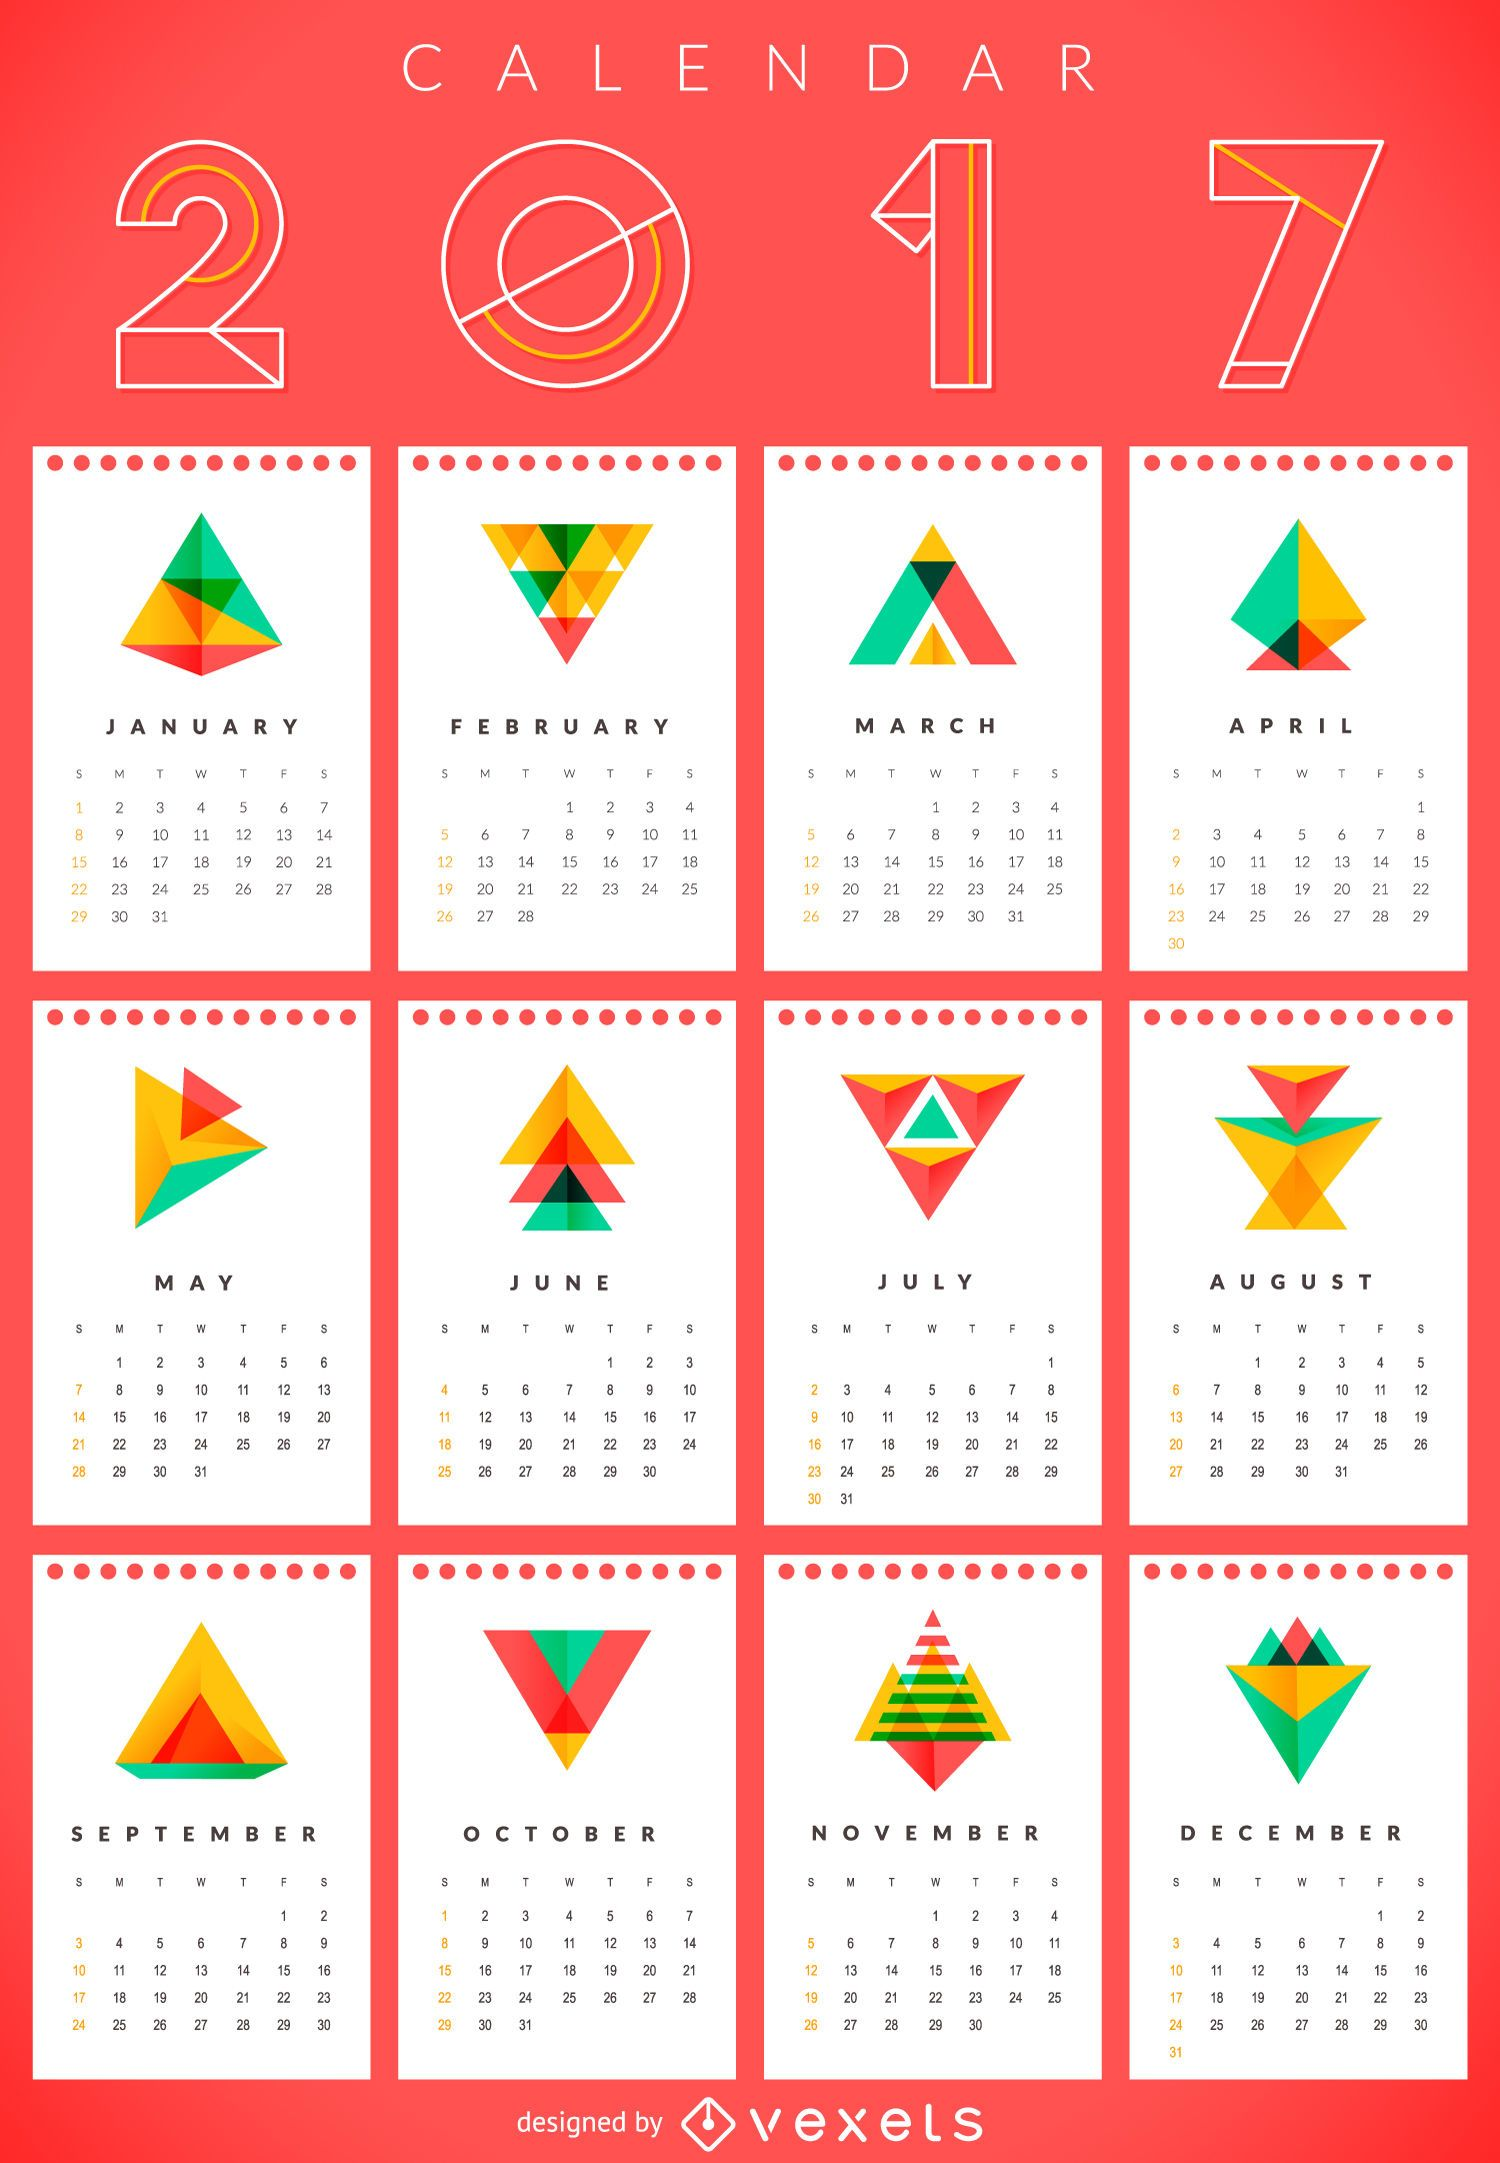 Calendario geométrico 2017